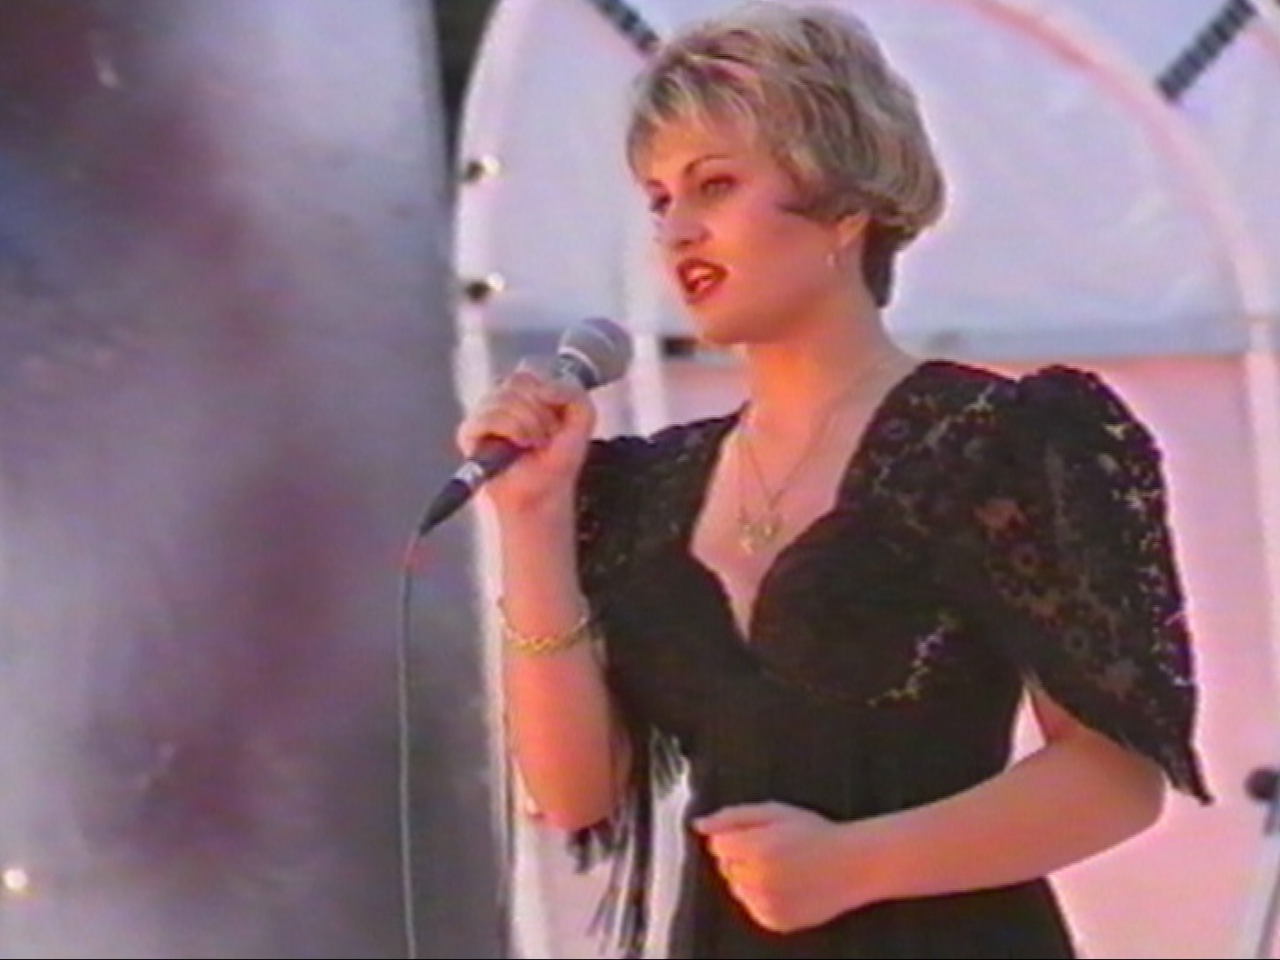 Amara 1995 - Premiul Tineretii - Georgiana Iordache.jpg